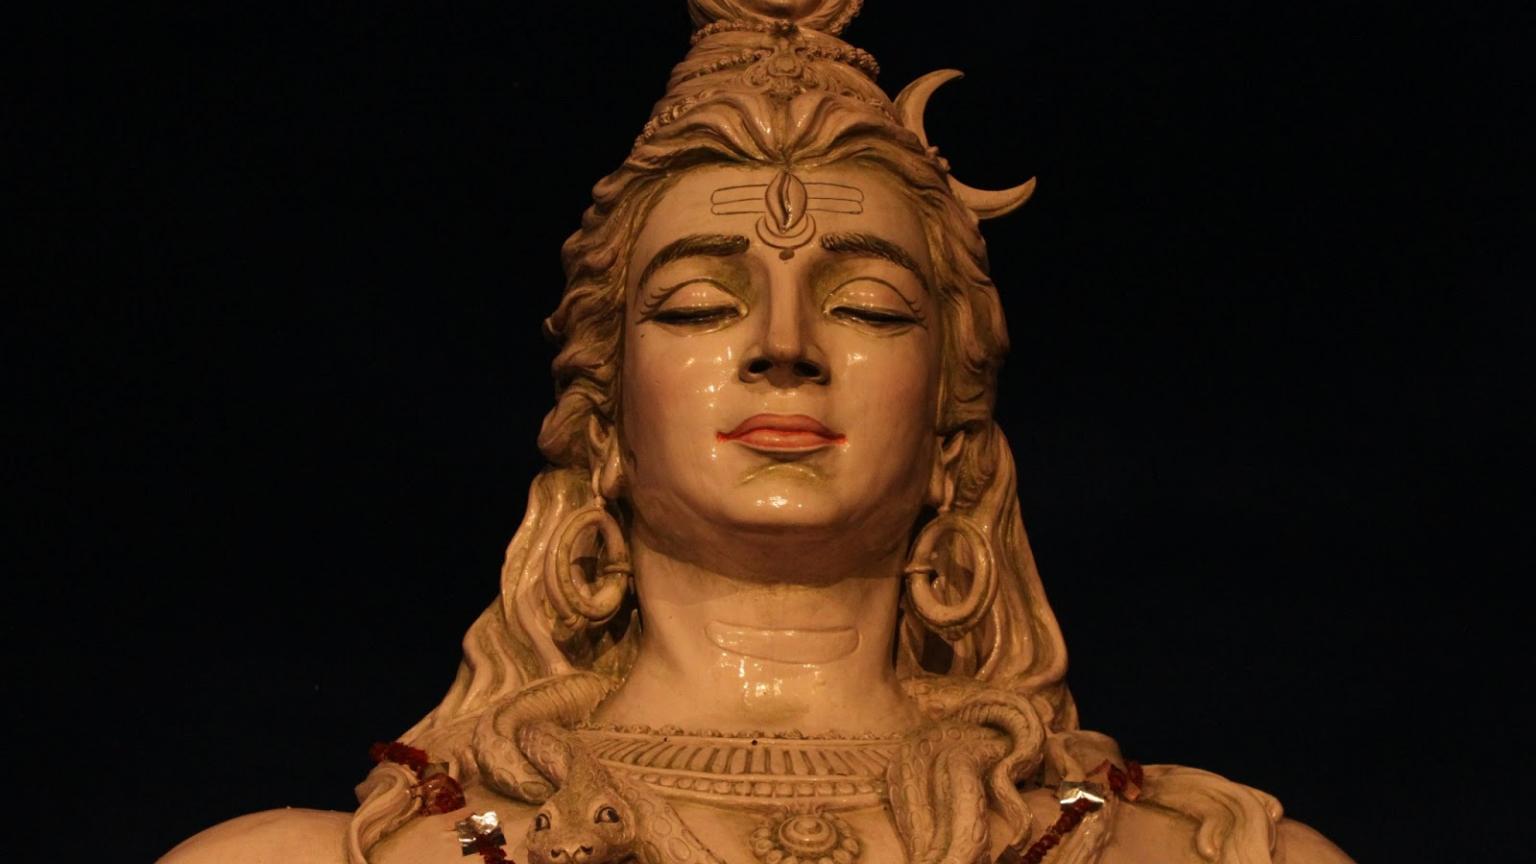 Free Download Lord Shiva Wallpapers Hd Download For Desktop Excellent Hd 1600x1180 For Your Desktop Mobile Tablet Explore 50 Lord Shiva Wallpapers Hd Hd Hindu God Desktop Wallpaper Hindu